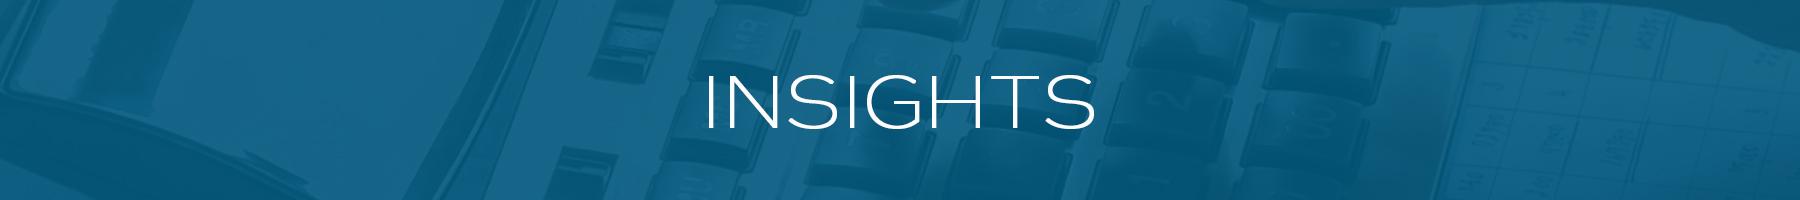 headers_insights.jpg